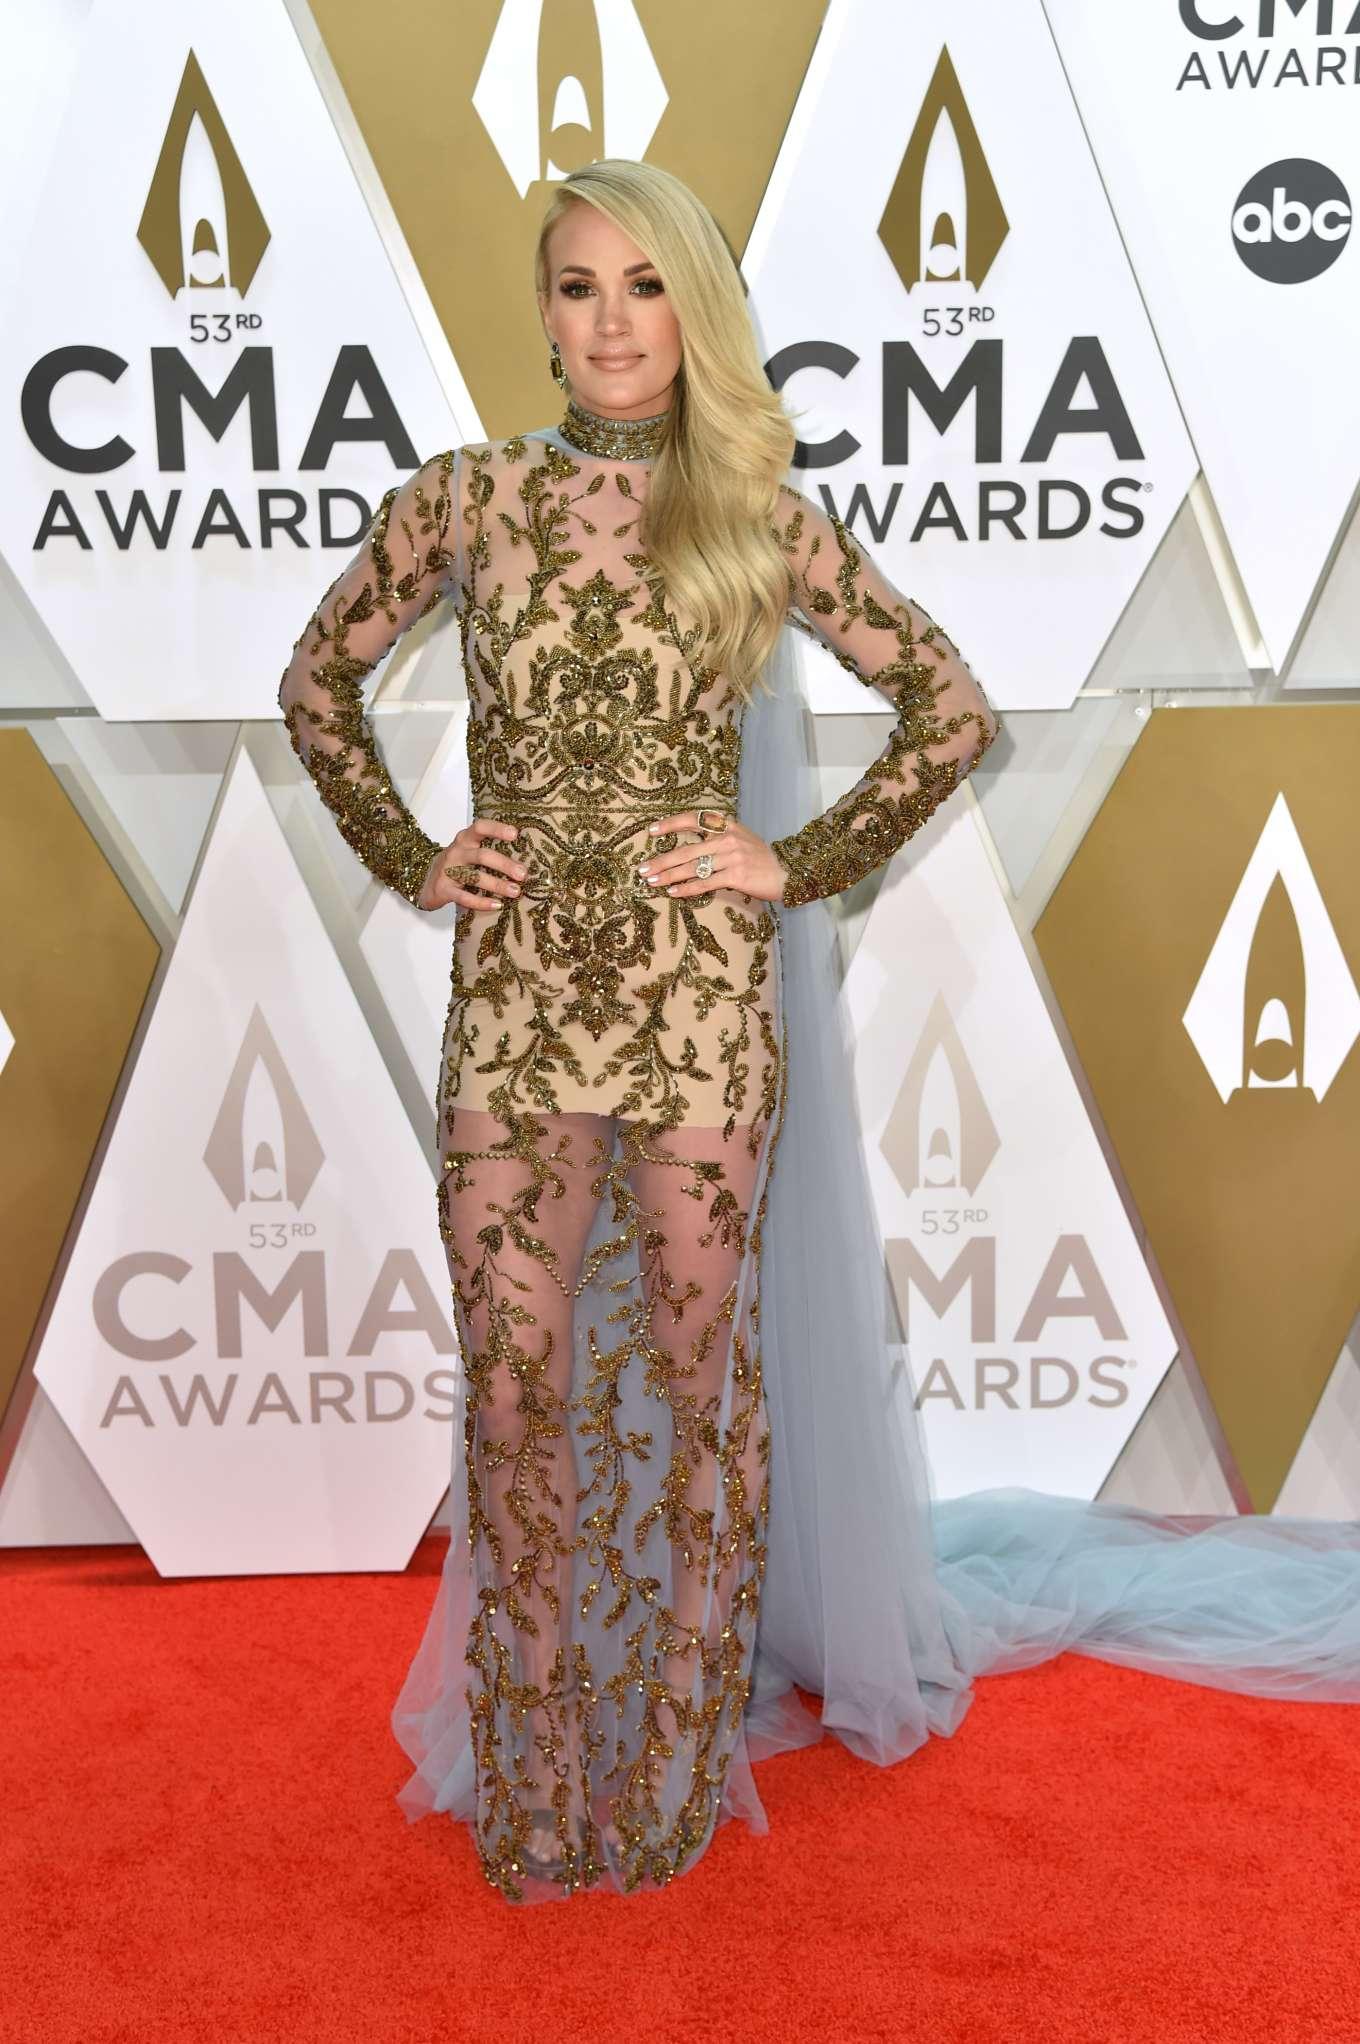 Carrie Underwood - 2019 CMA Awards in Nashville